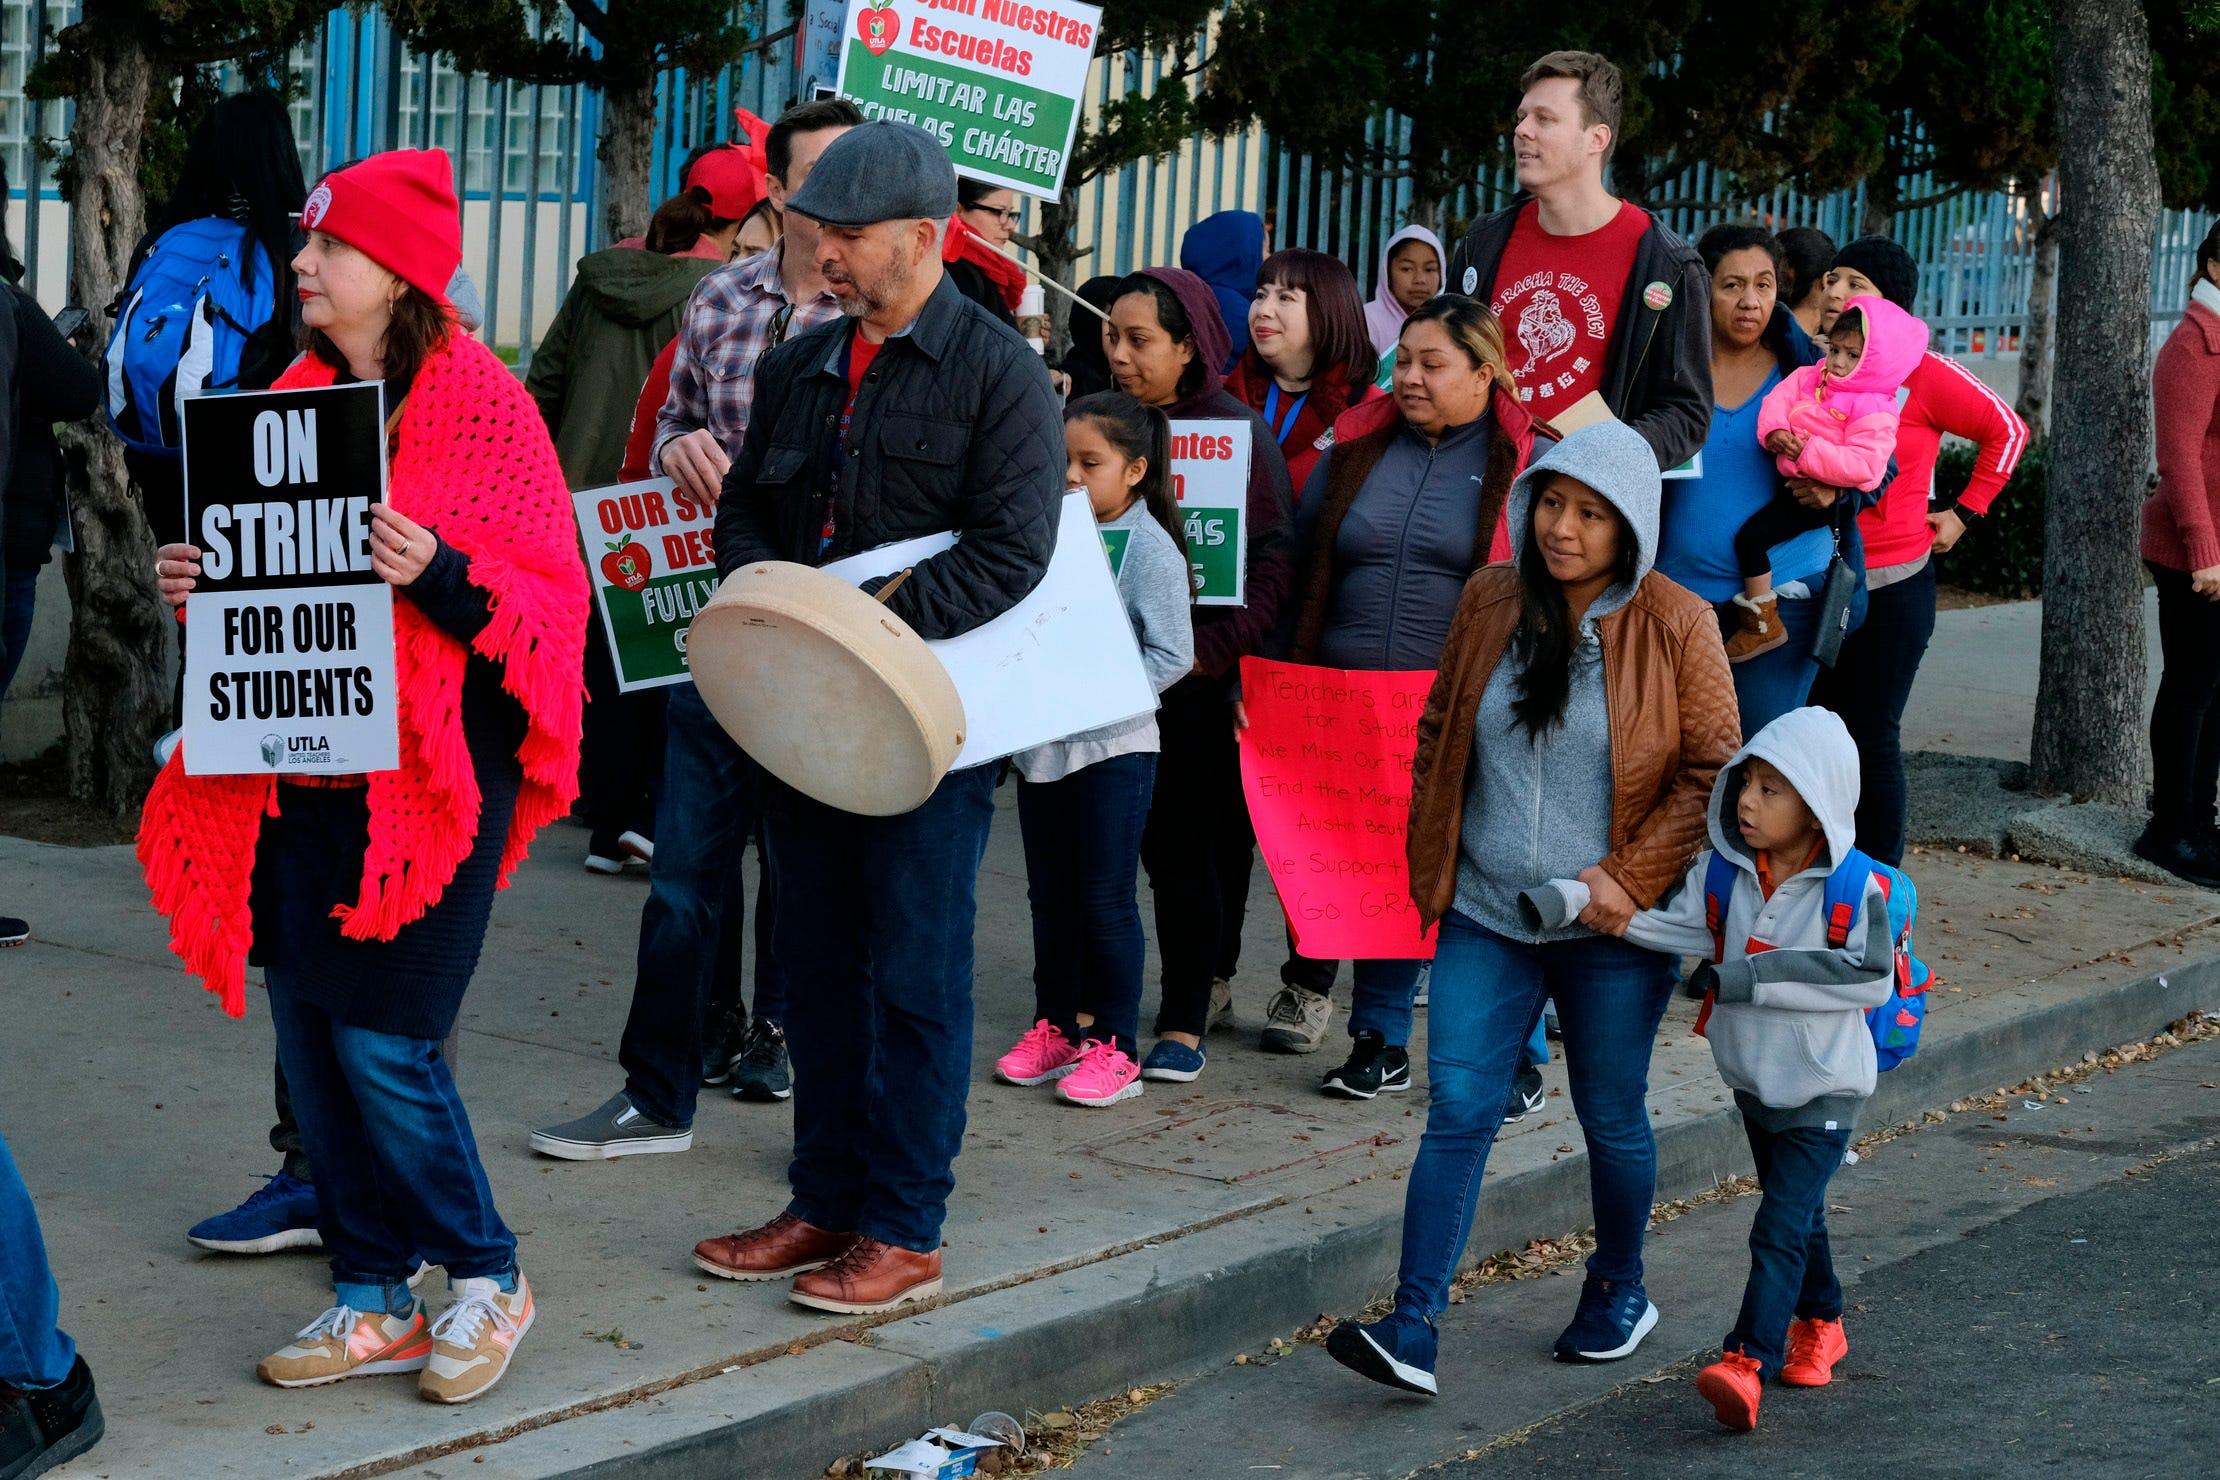 Los Angeles' striking teachers reach 'historic' settlement with school district